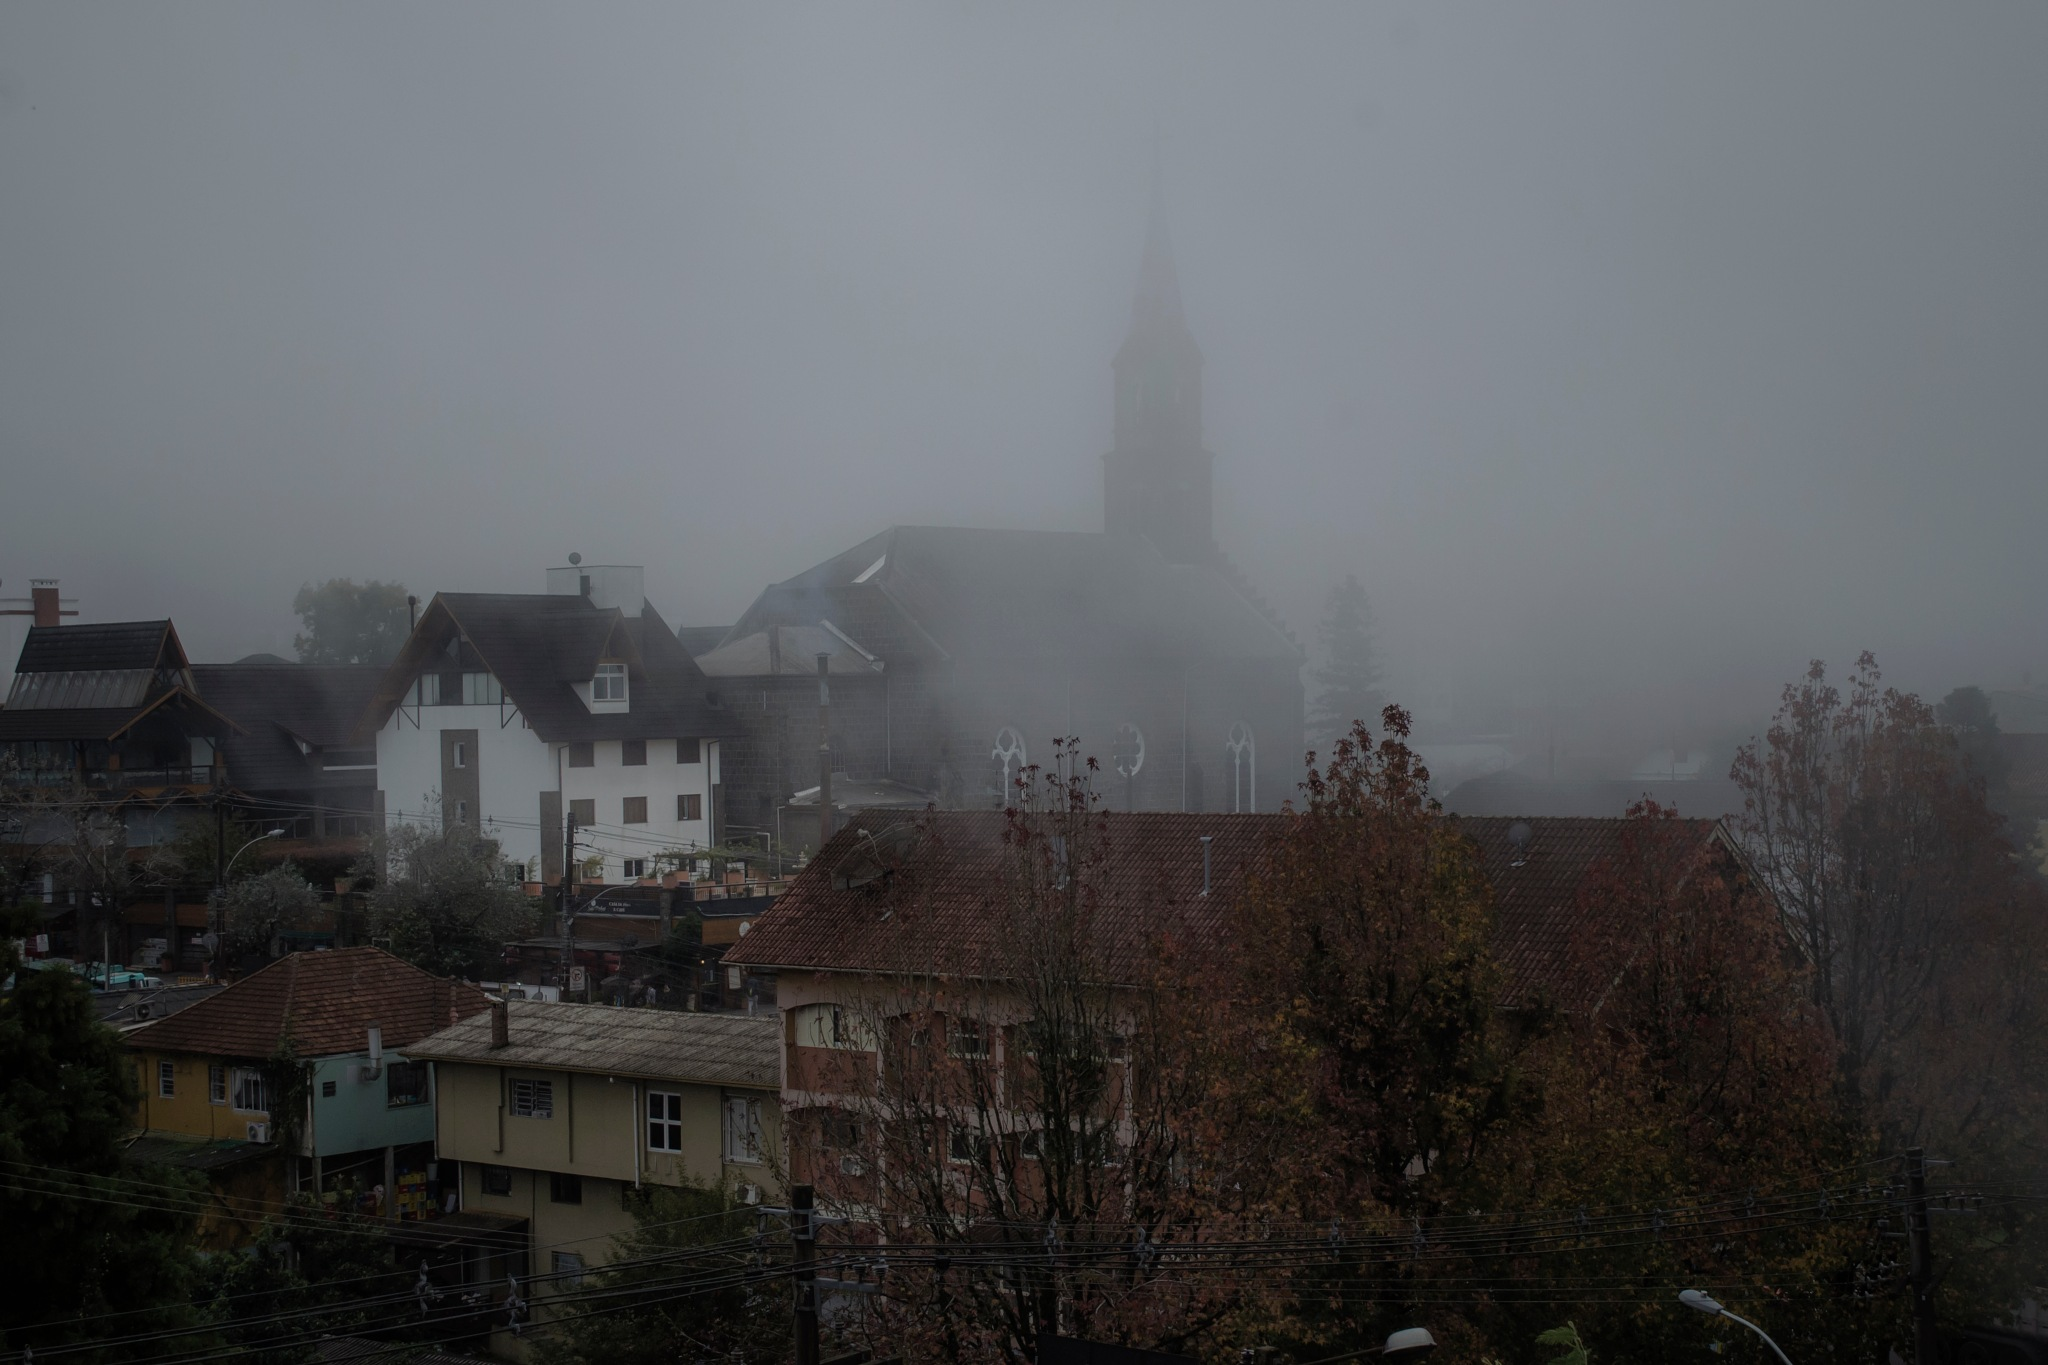 Fog by jcarloscmonteiro